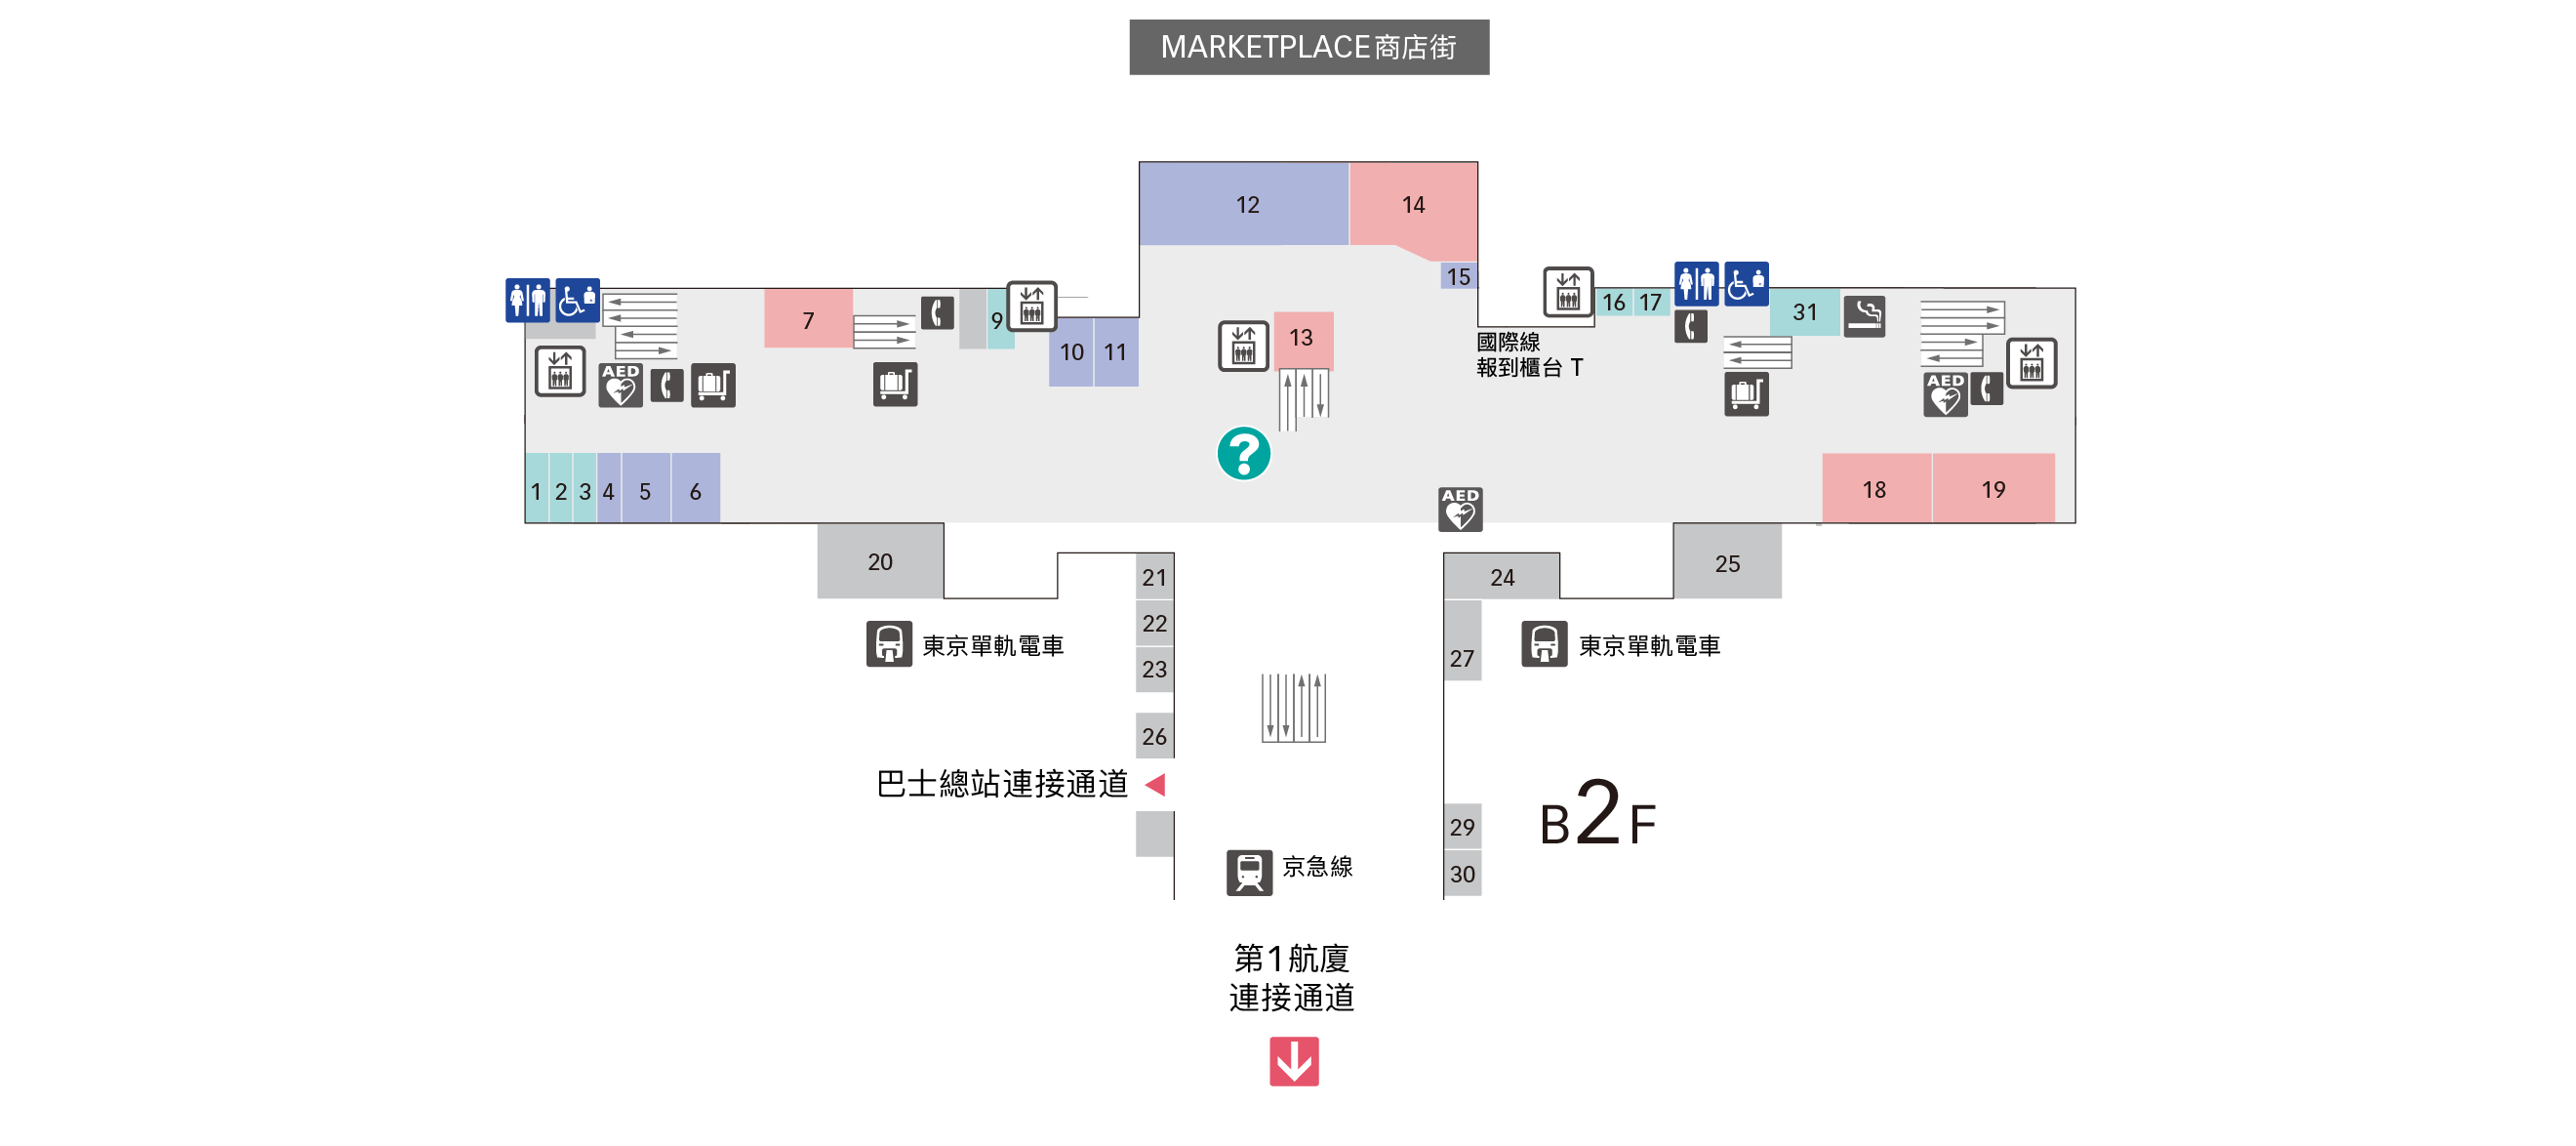 B1F京急線/東京單軌電車樓層地圖